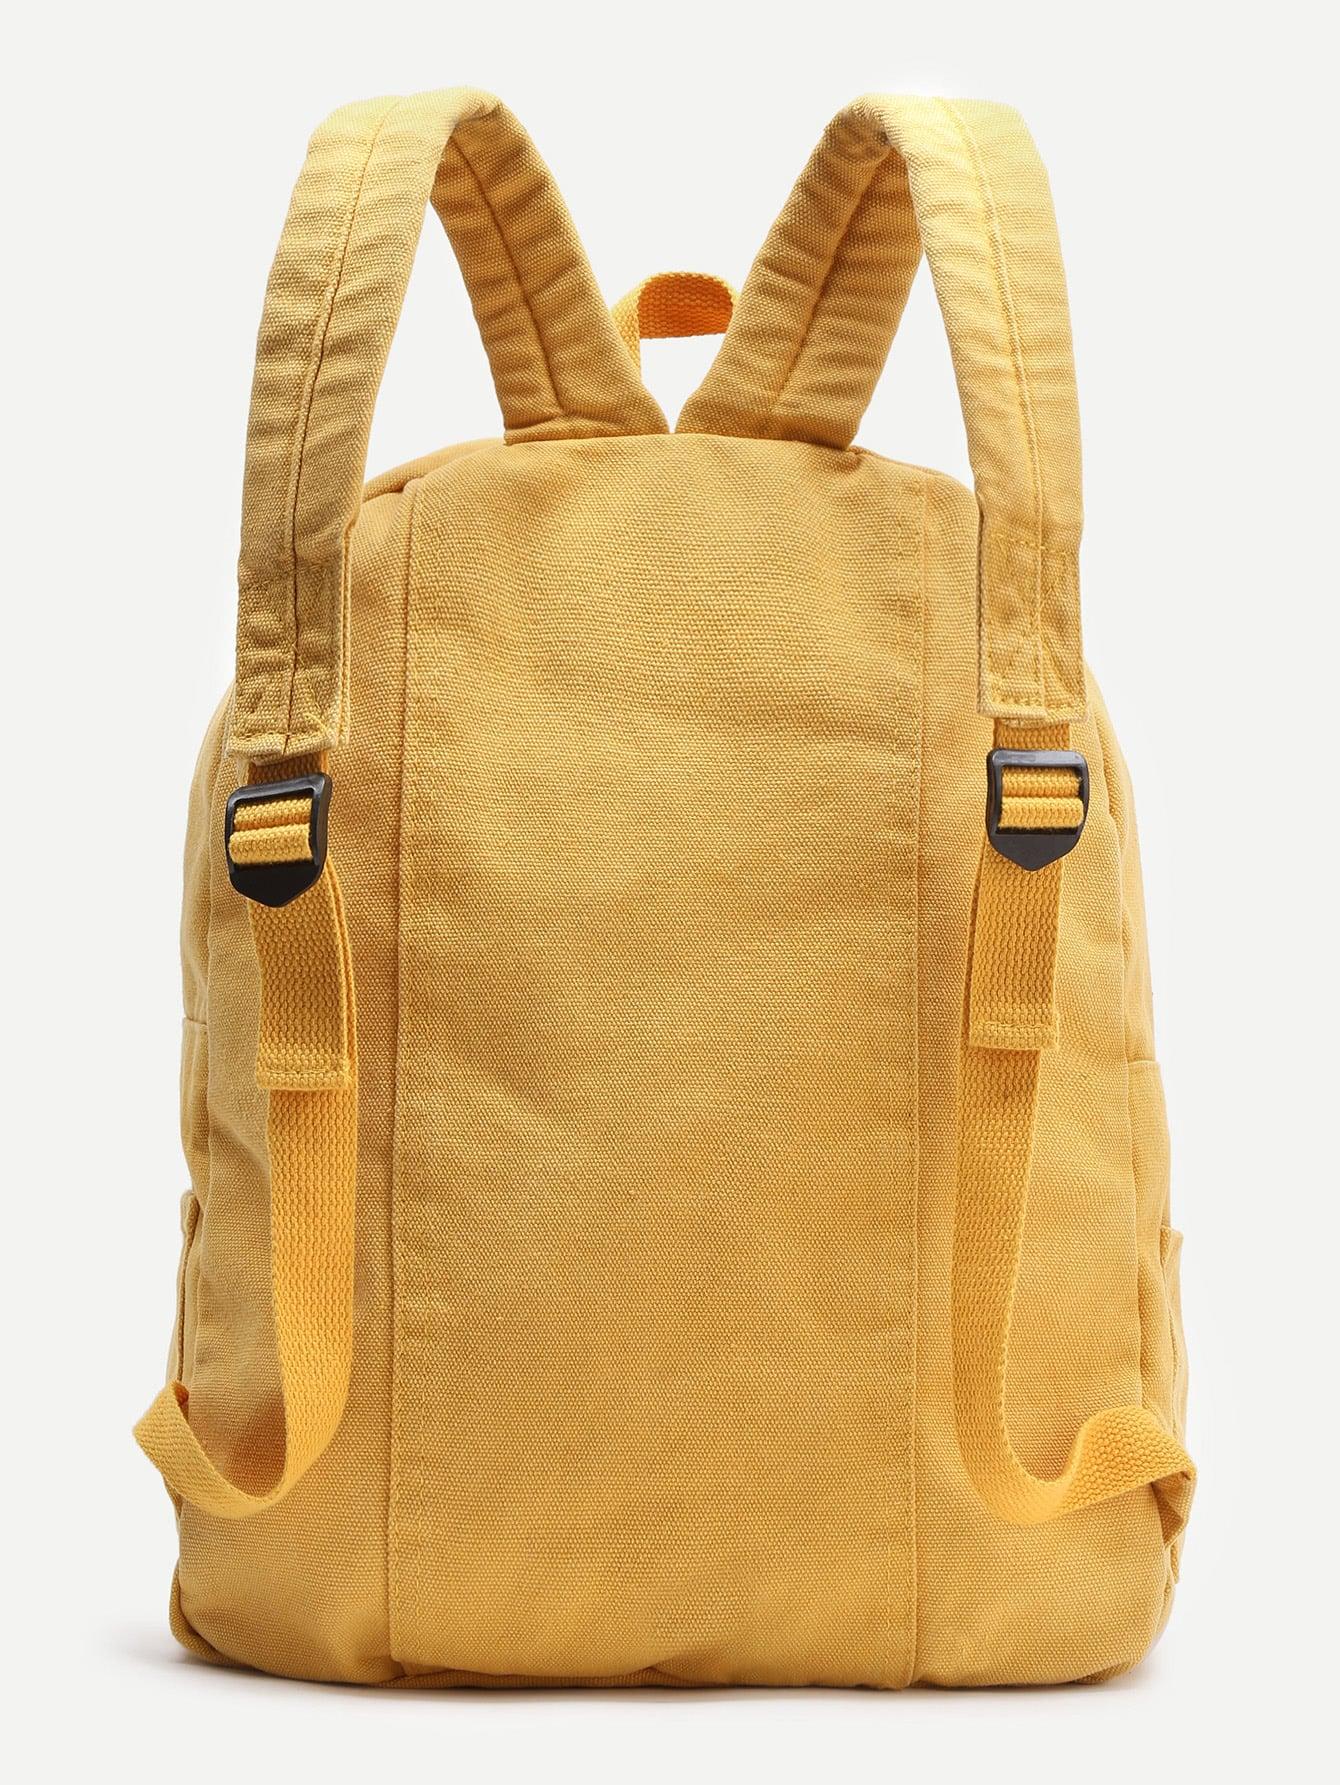 Yellow Zipper Front Canvas Backpack -SheIn(Sheinside)